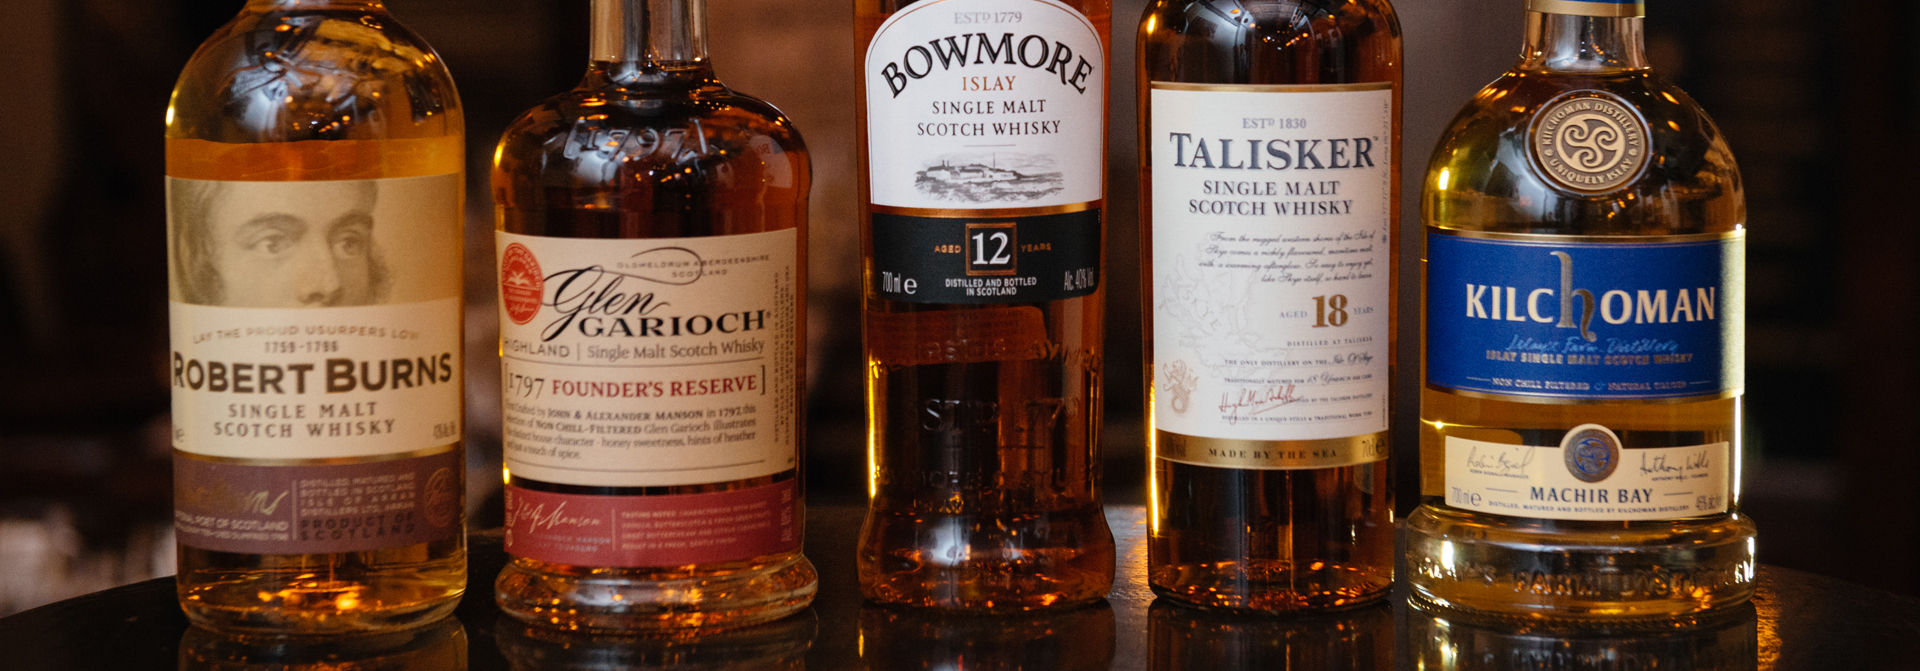 the tasters club whisky tasting robert burns arran glengarioch bowmore talisker kilchoman avalon